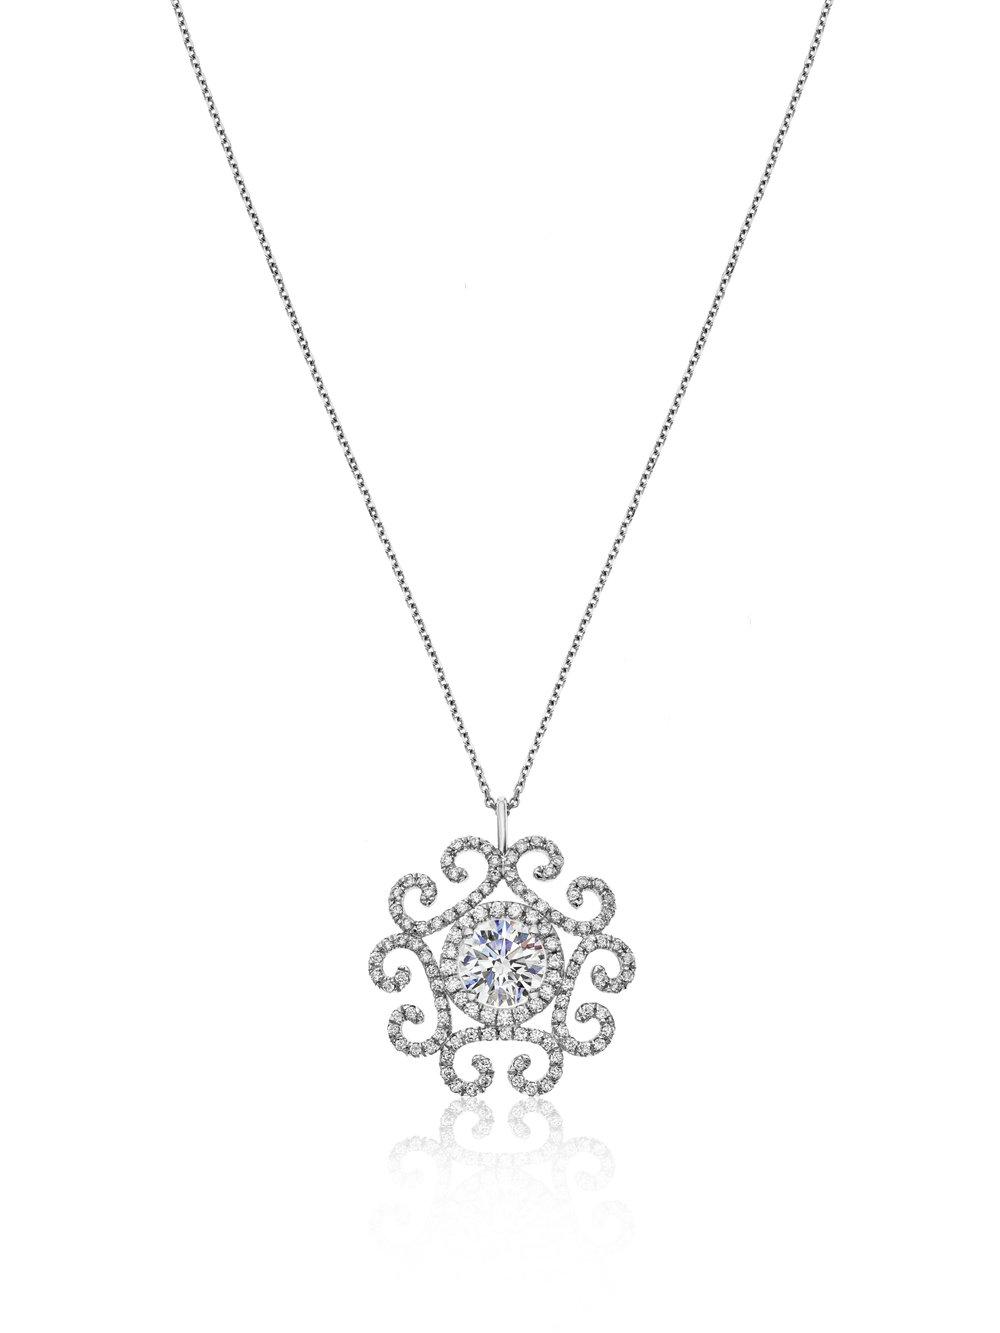 Diamond Pendant.jpeg